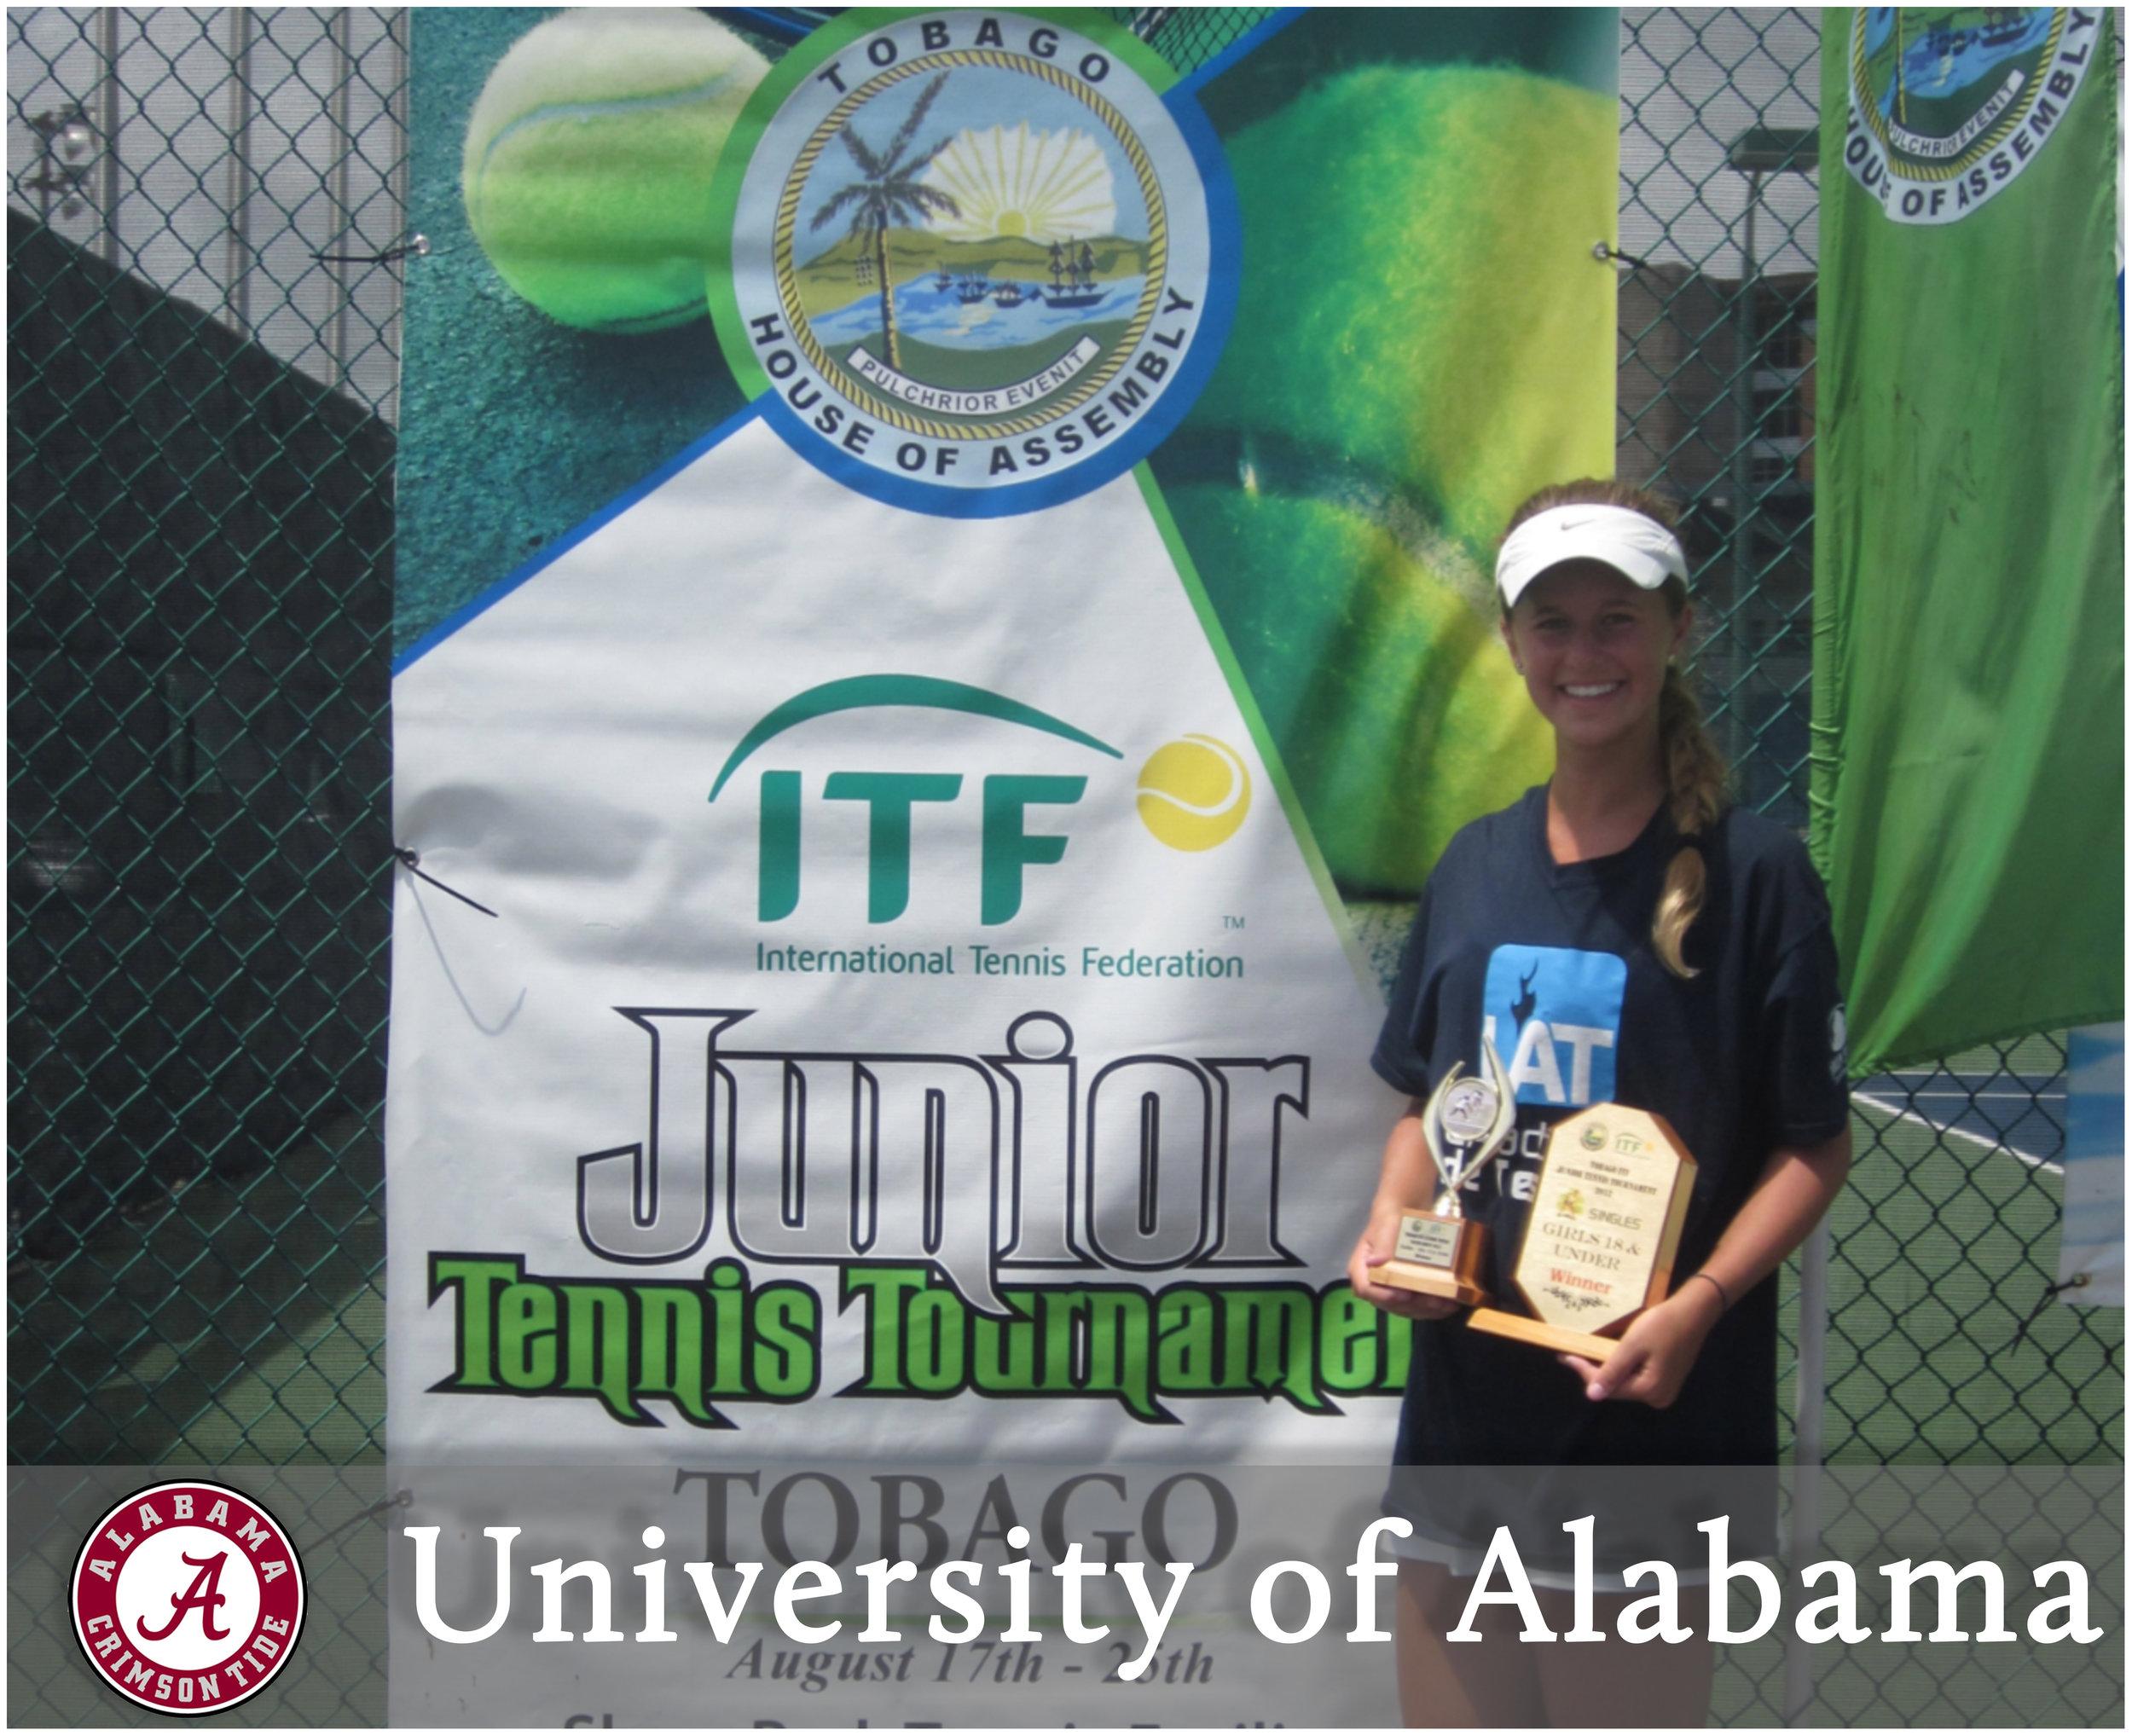 - Maddie Pothoff (Tucson, Arizona)Blue-Chip Recruit - #10 on TennisRecruiting#251 ITF World Junior RankingUSTA National Clay Court - Doubles ChampionNCAA D1 National Championship - Doubles Finalist